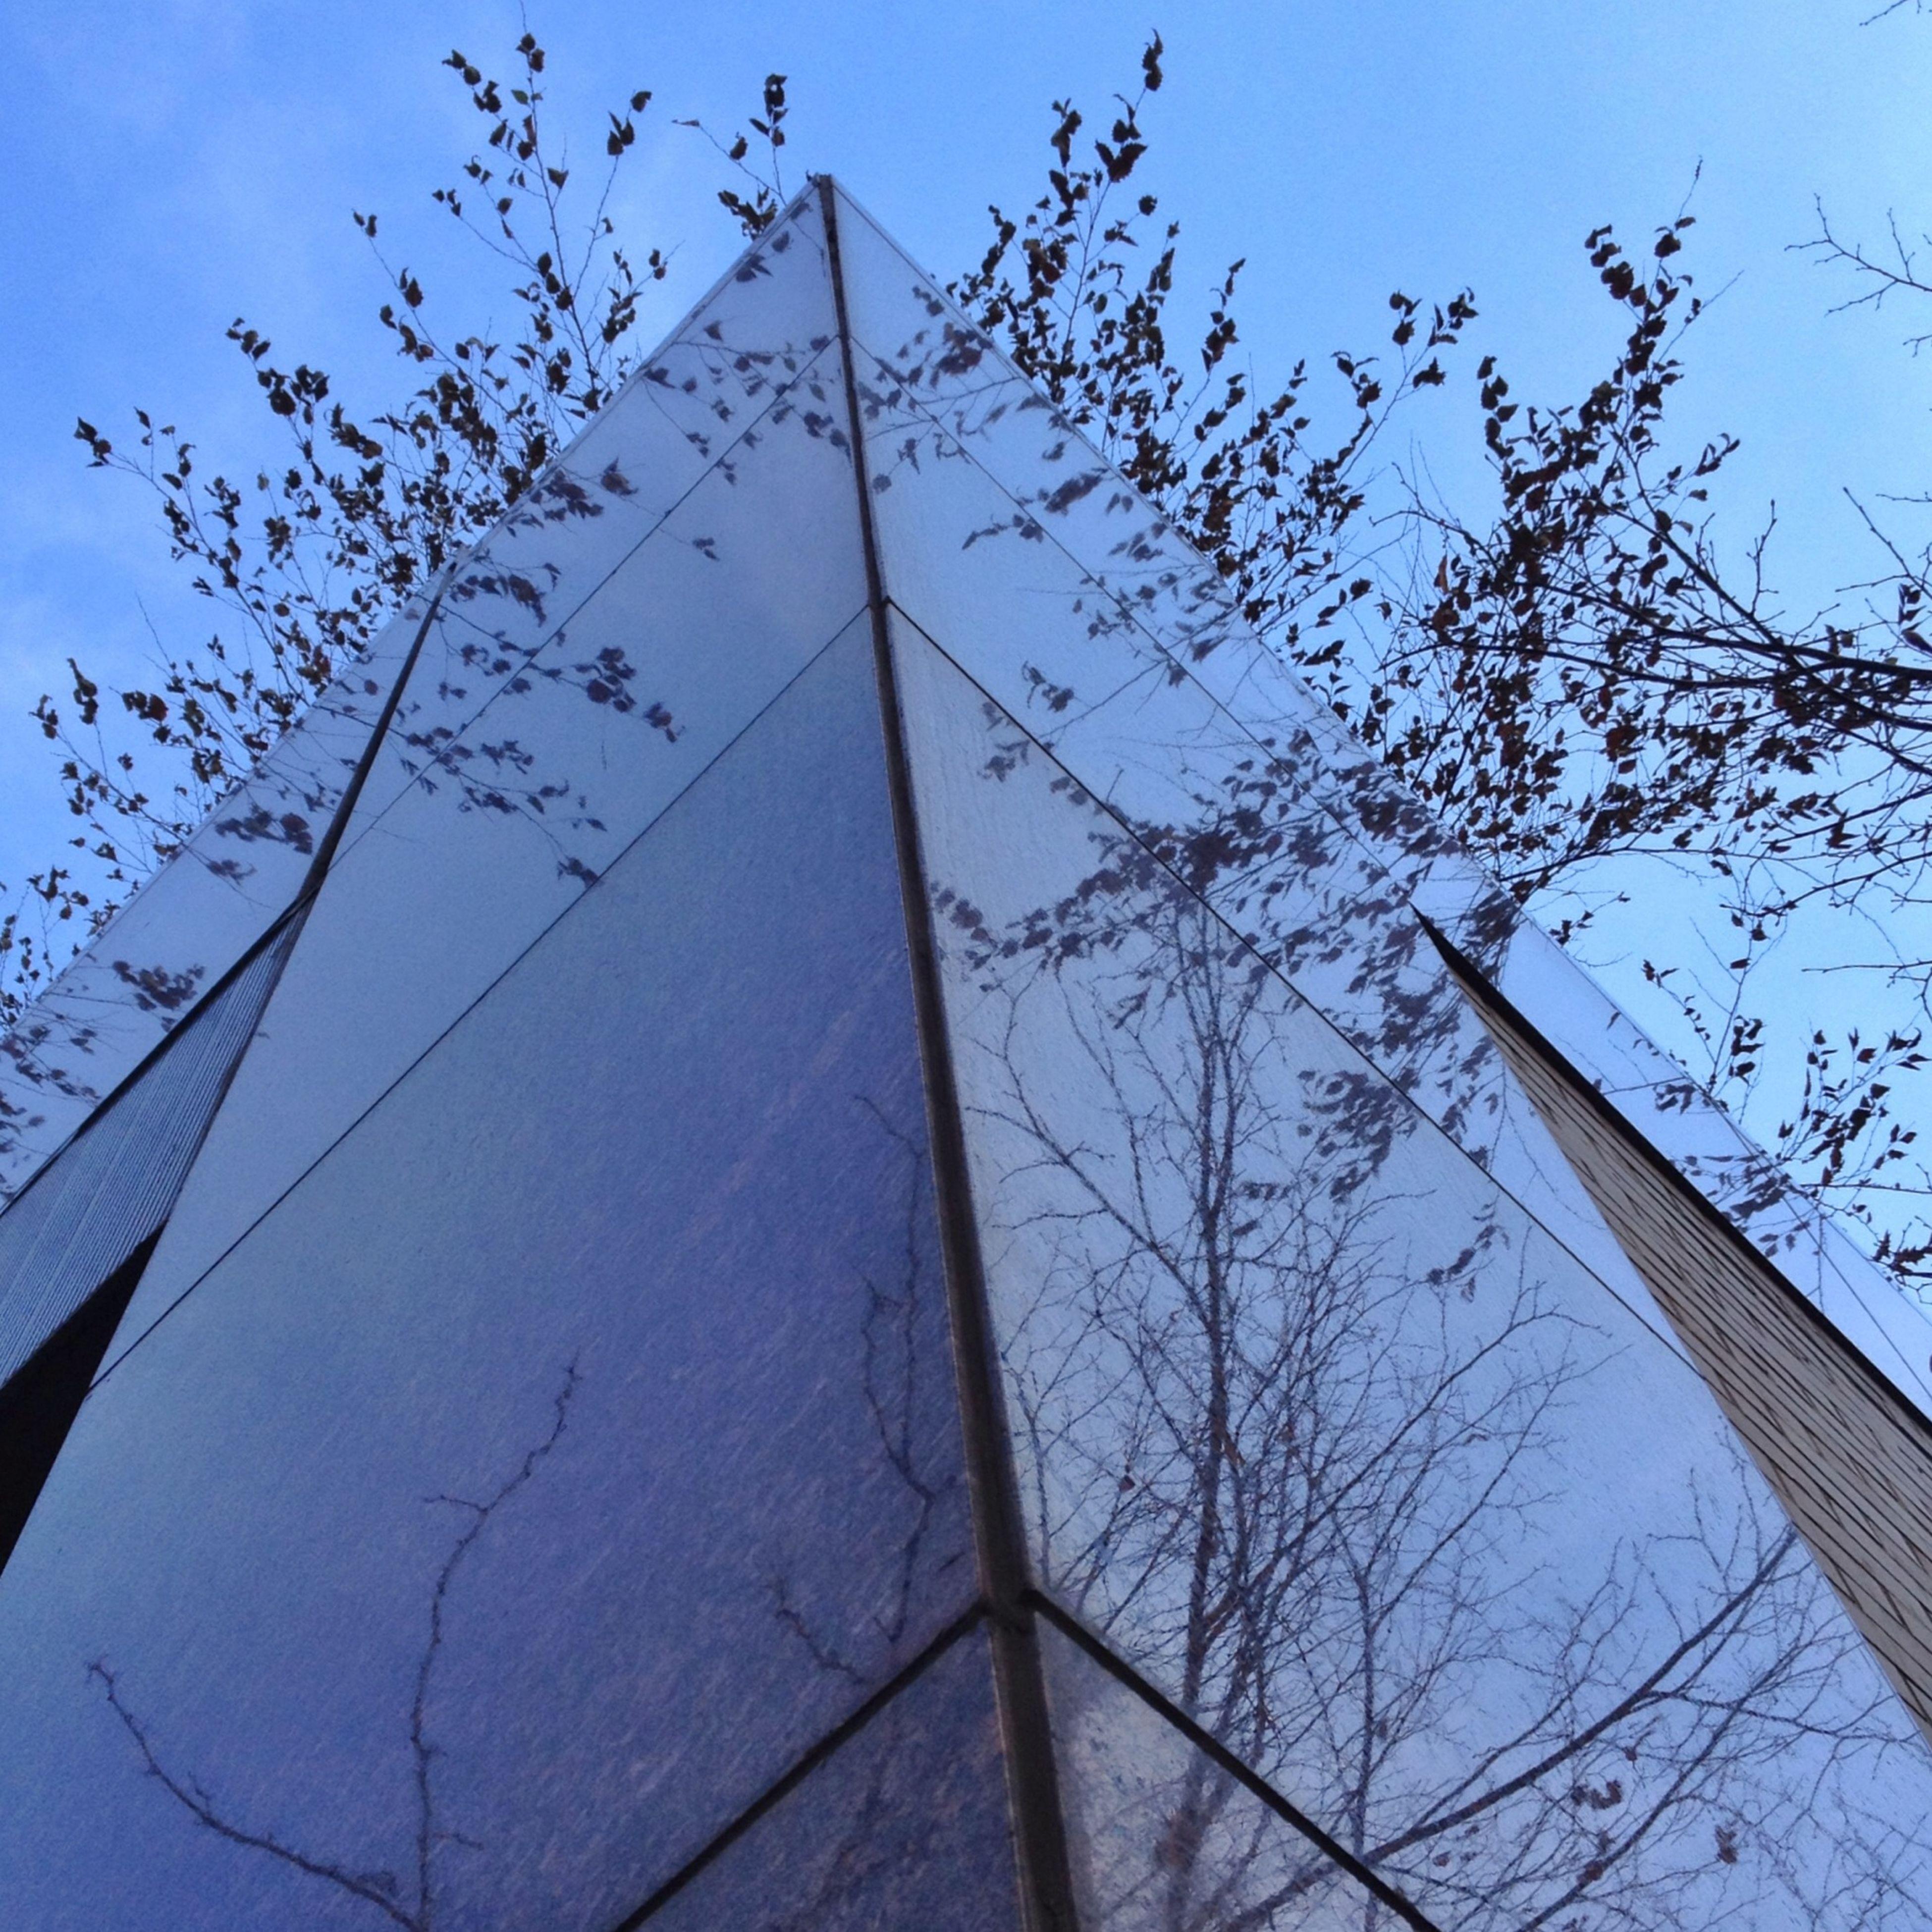 Alive EyeEm Best Shots - Architecture Shootermag WeAreJuxt Architecture